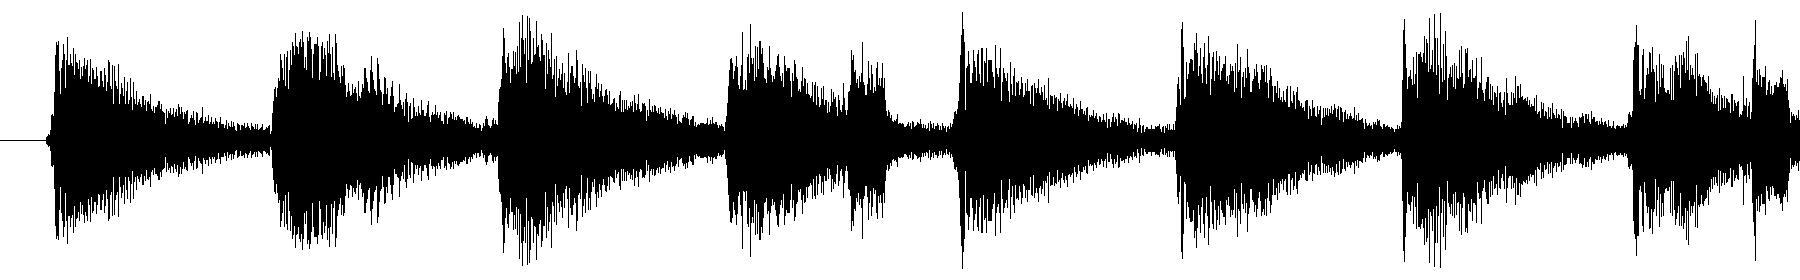 vedh melodyloop 028 cm gm am fm 126bpm